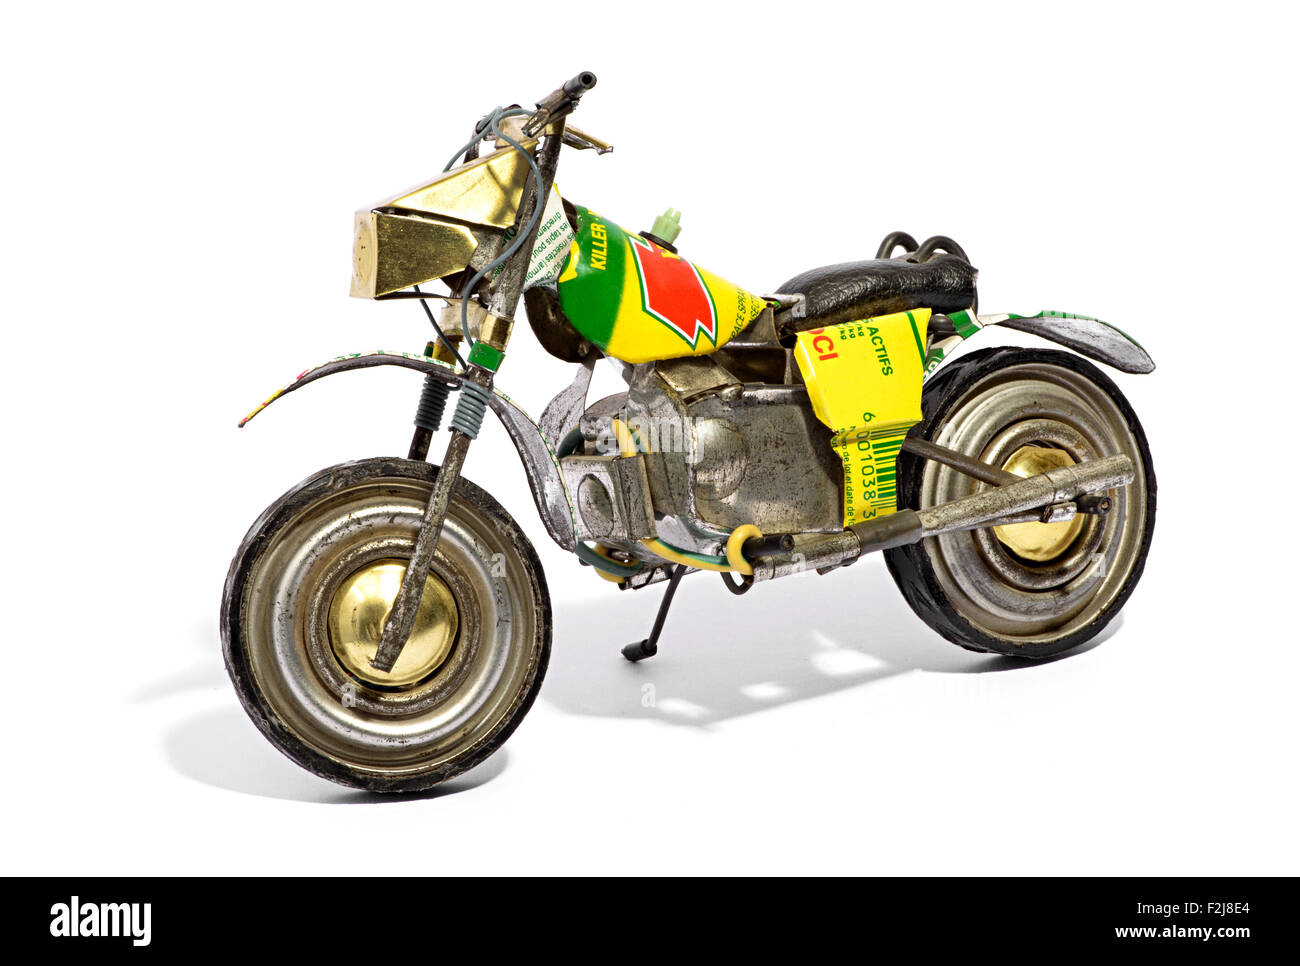 Scale model of a retro motorbike - Stock Image